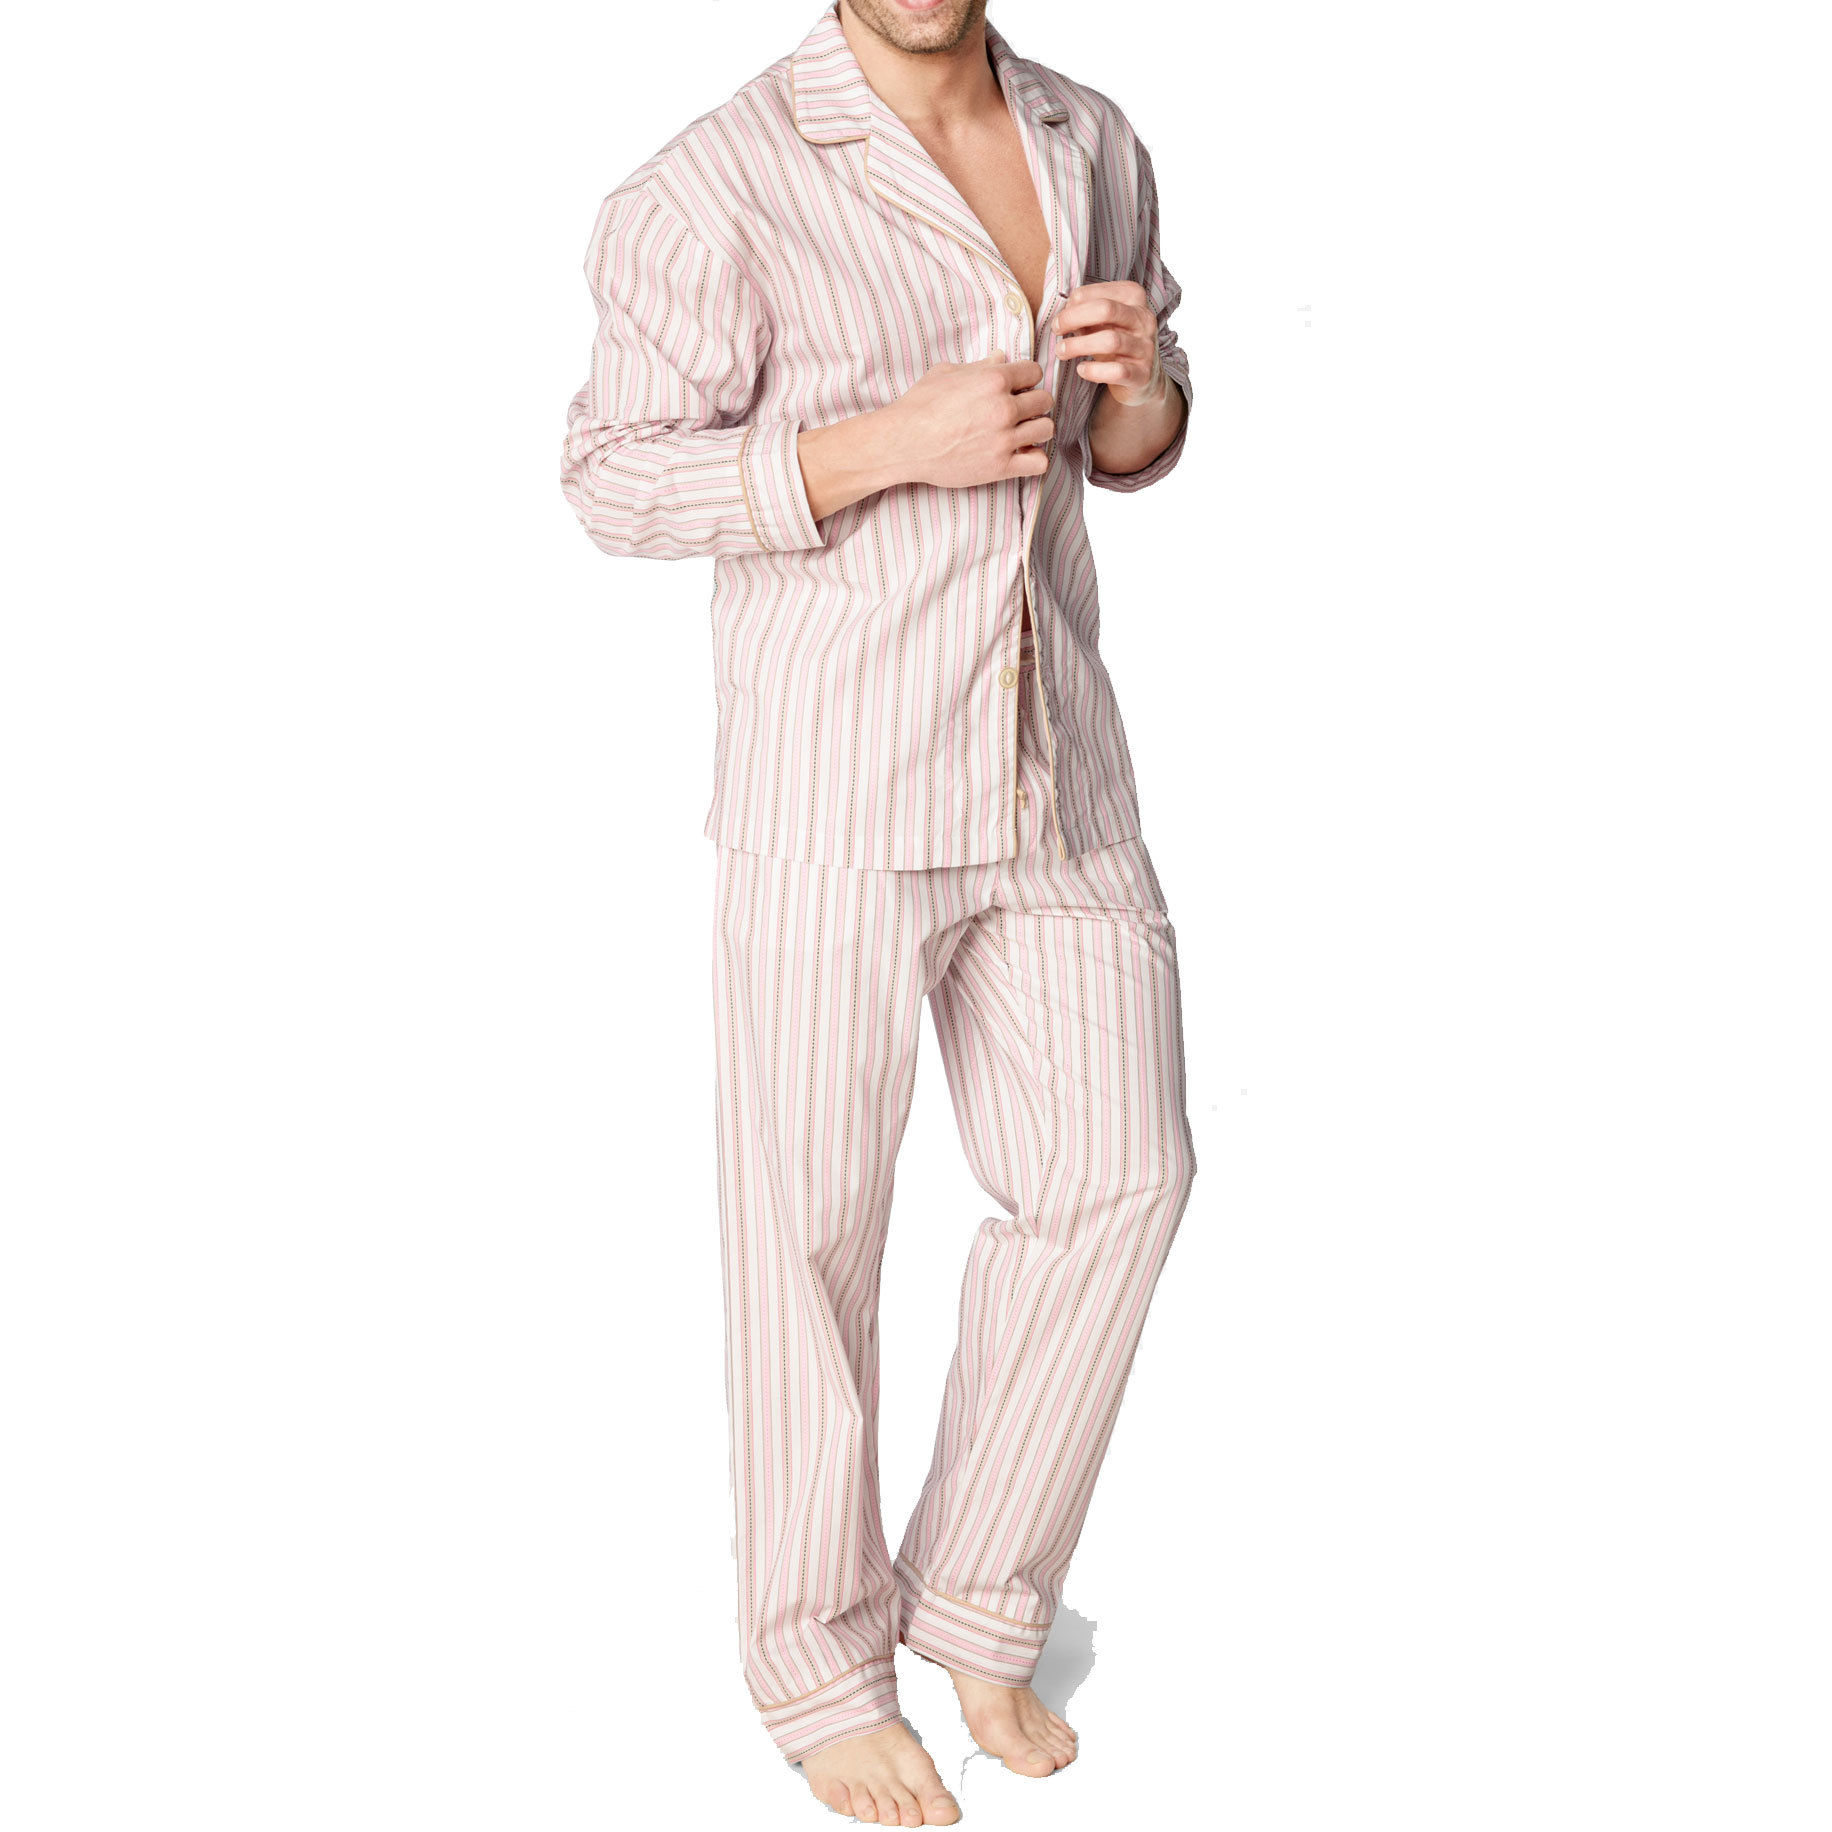 [SALE] BedHead Pajamas メンズコットンパジャマ  Pink Rail Road Stripe